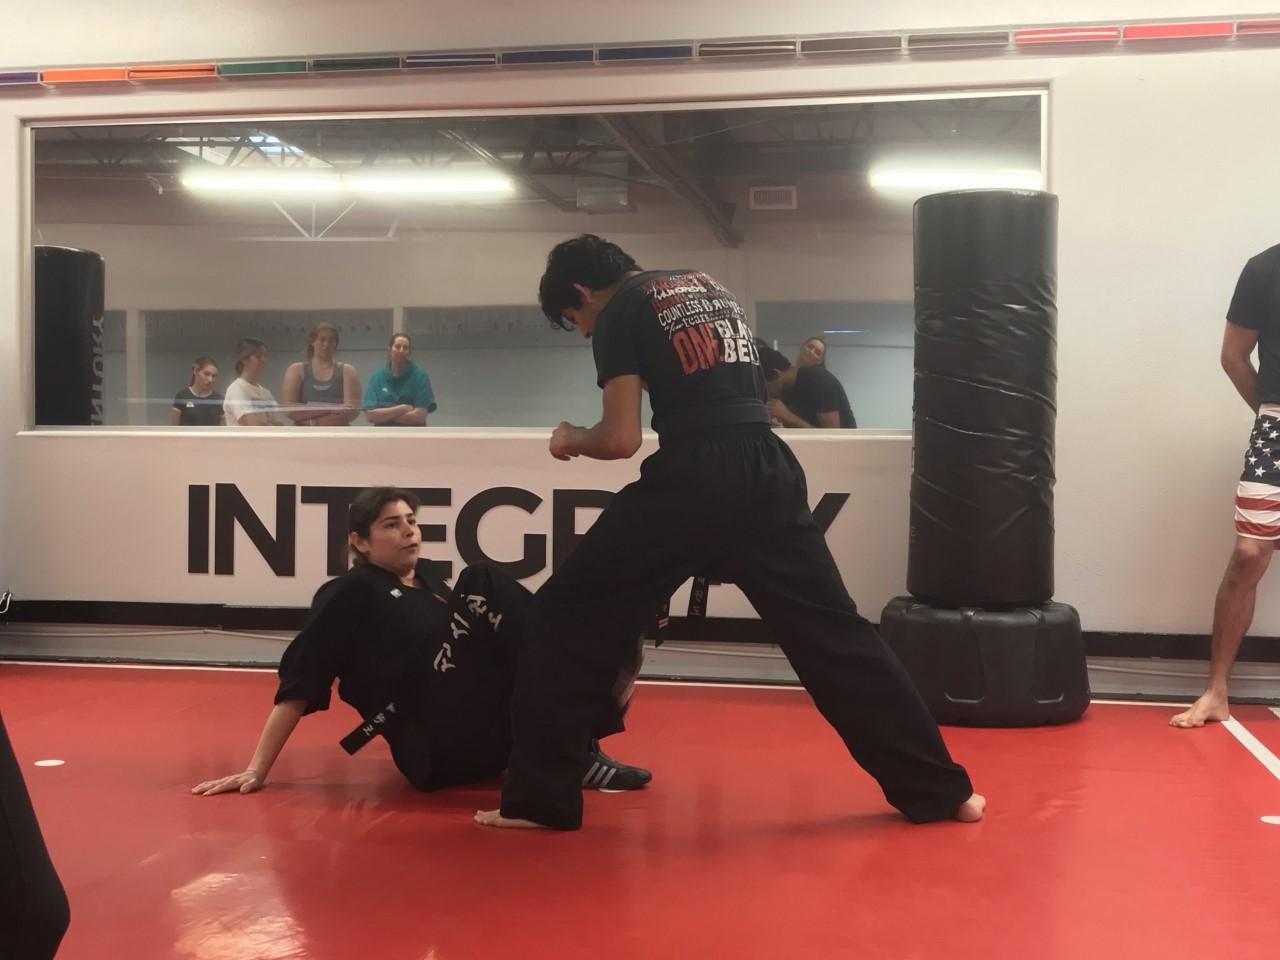 Shin's, QueerSCV lead course in self defense